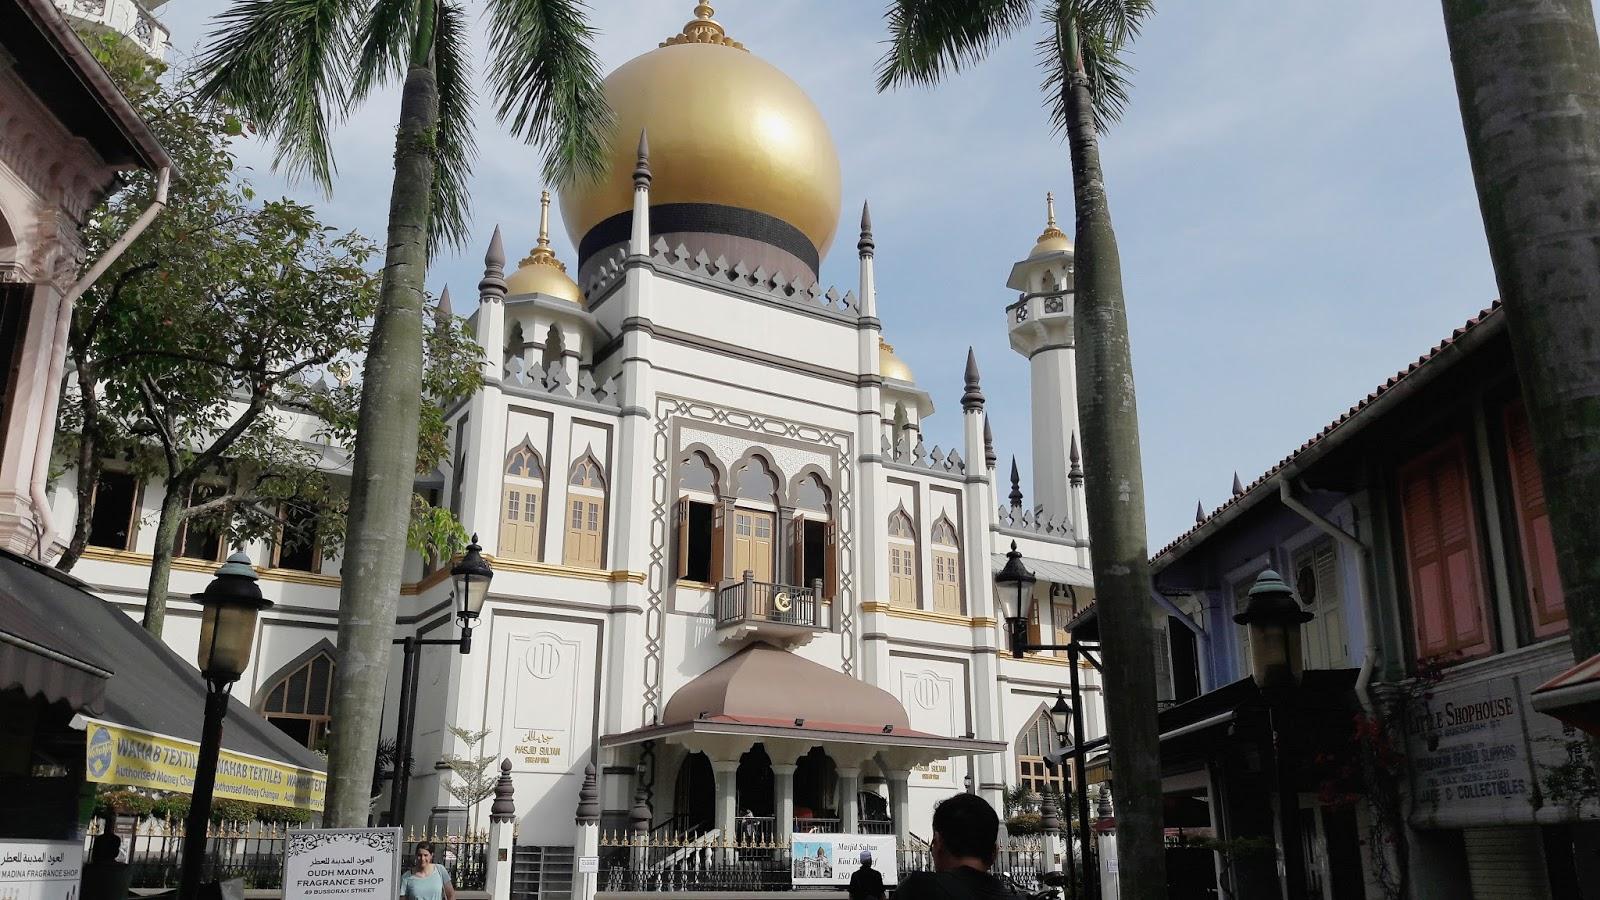 Catatan Perjalanan Tiket Fisik Garden By The Bay Anak Titip Di Hotel Singapore Sultan Mosque